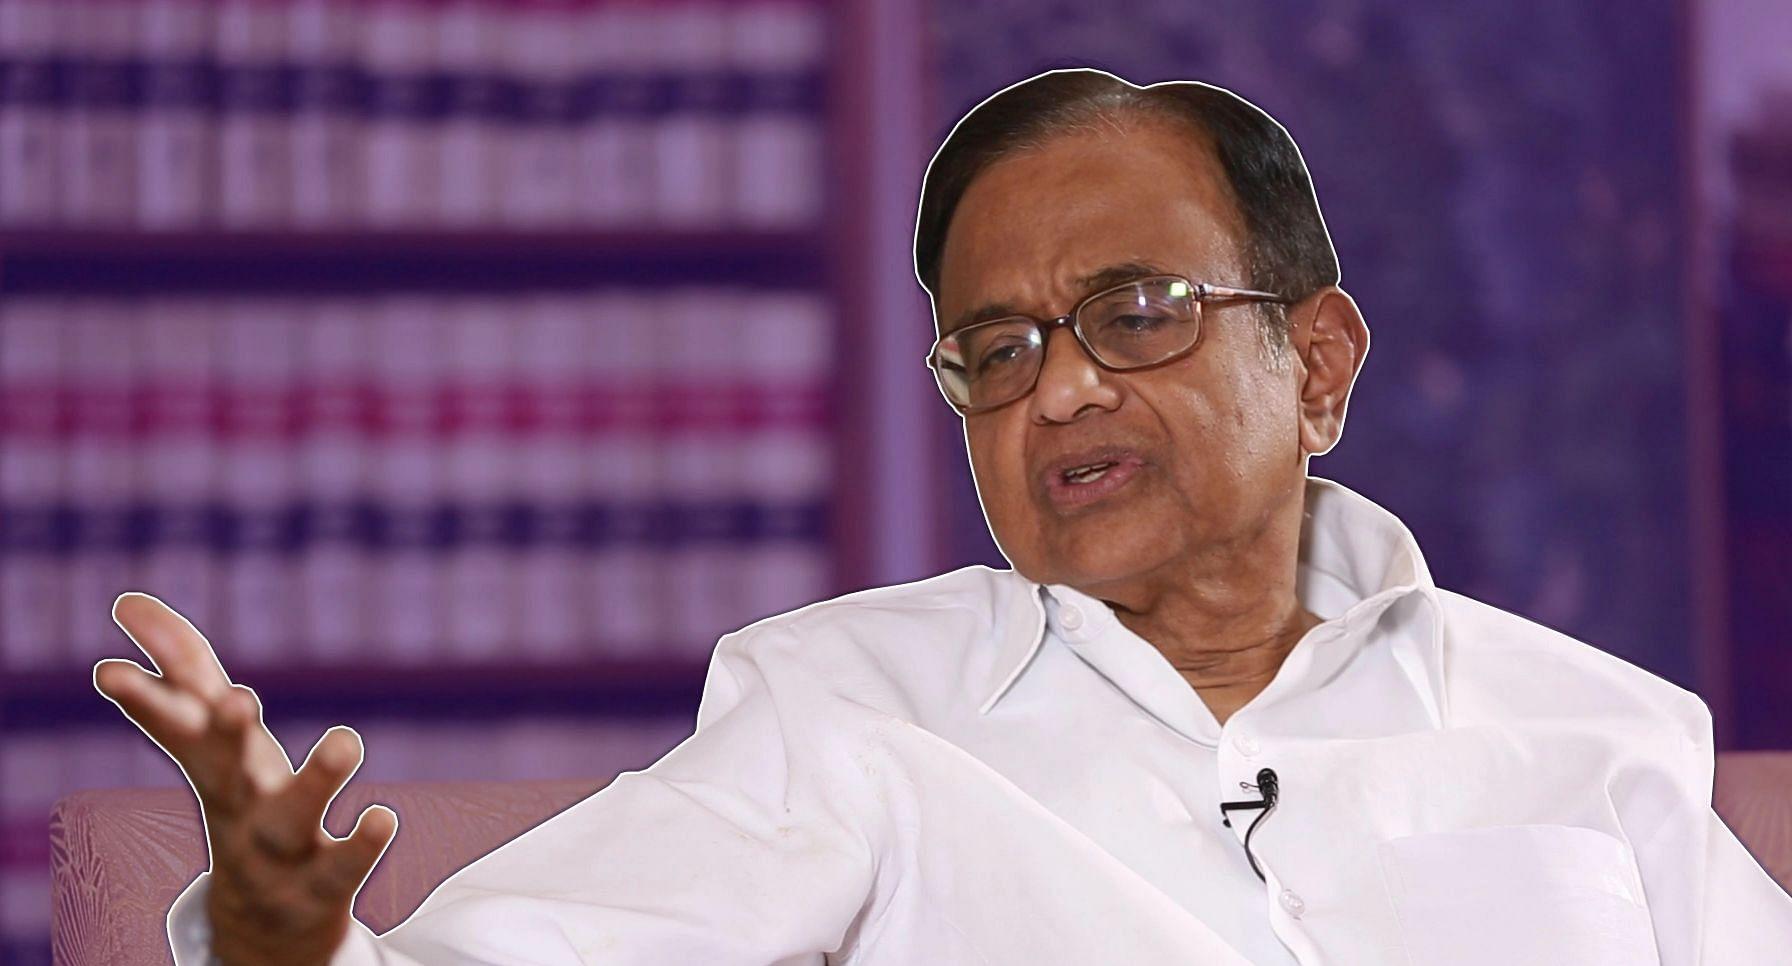 'Job Crisis to Worsen, Businesses Scared to Invest': P Chidambaram